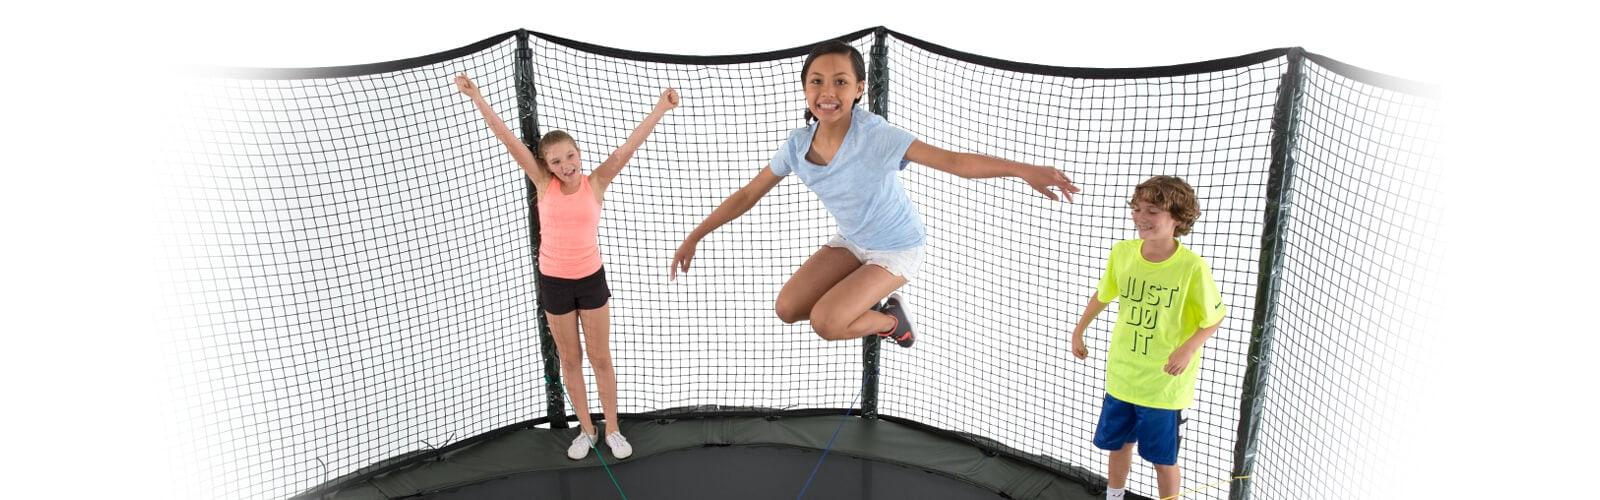 JumpSport - US